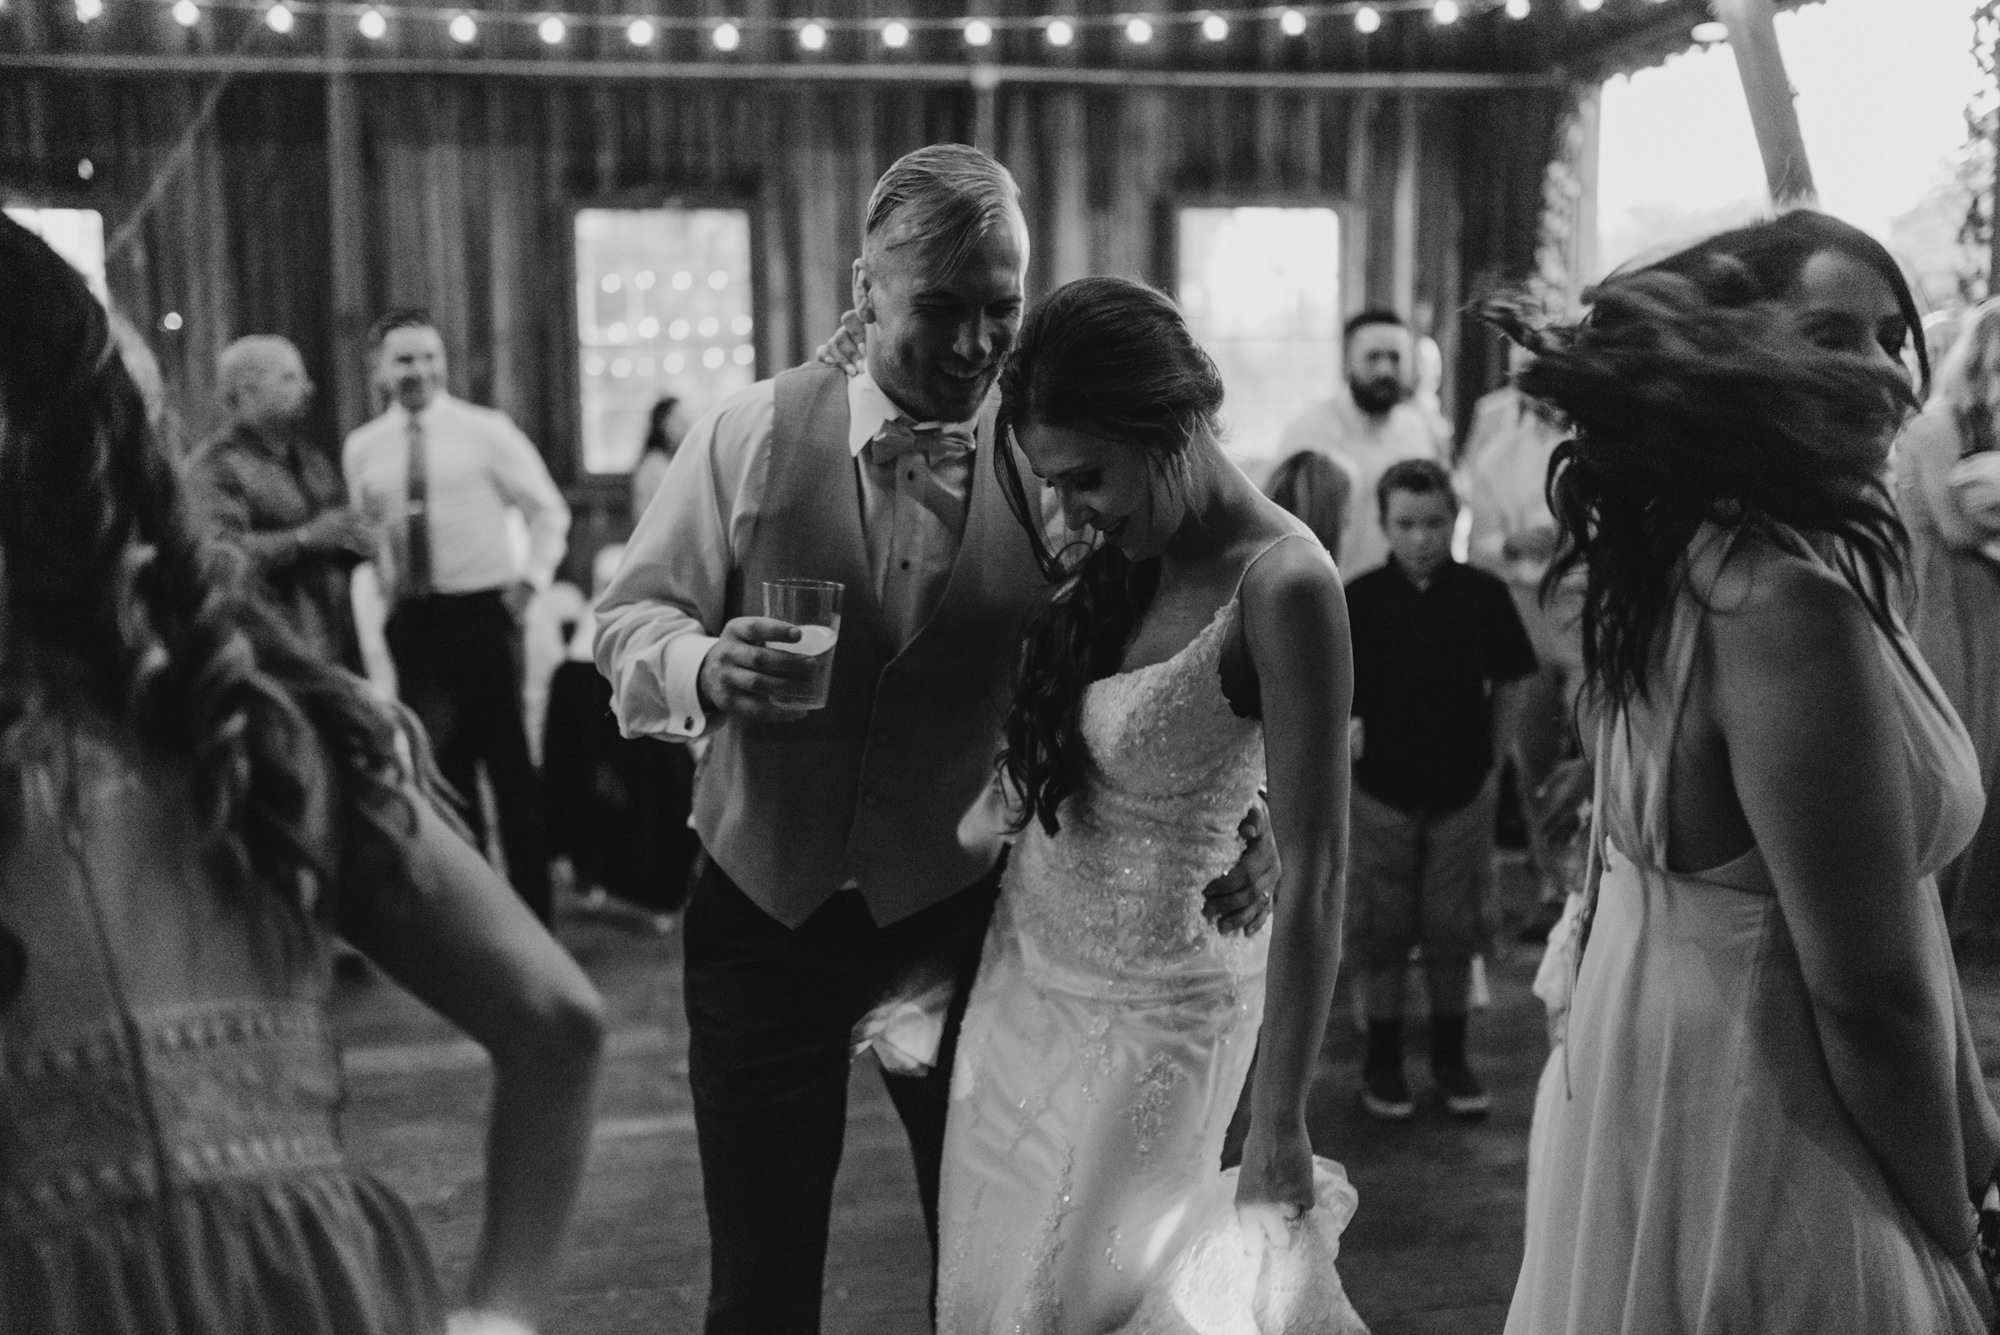 208-portland-northwest-wedding-bubble-exit-barn-string-lights.jpg